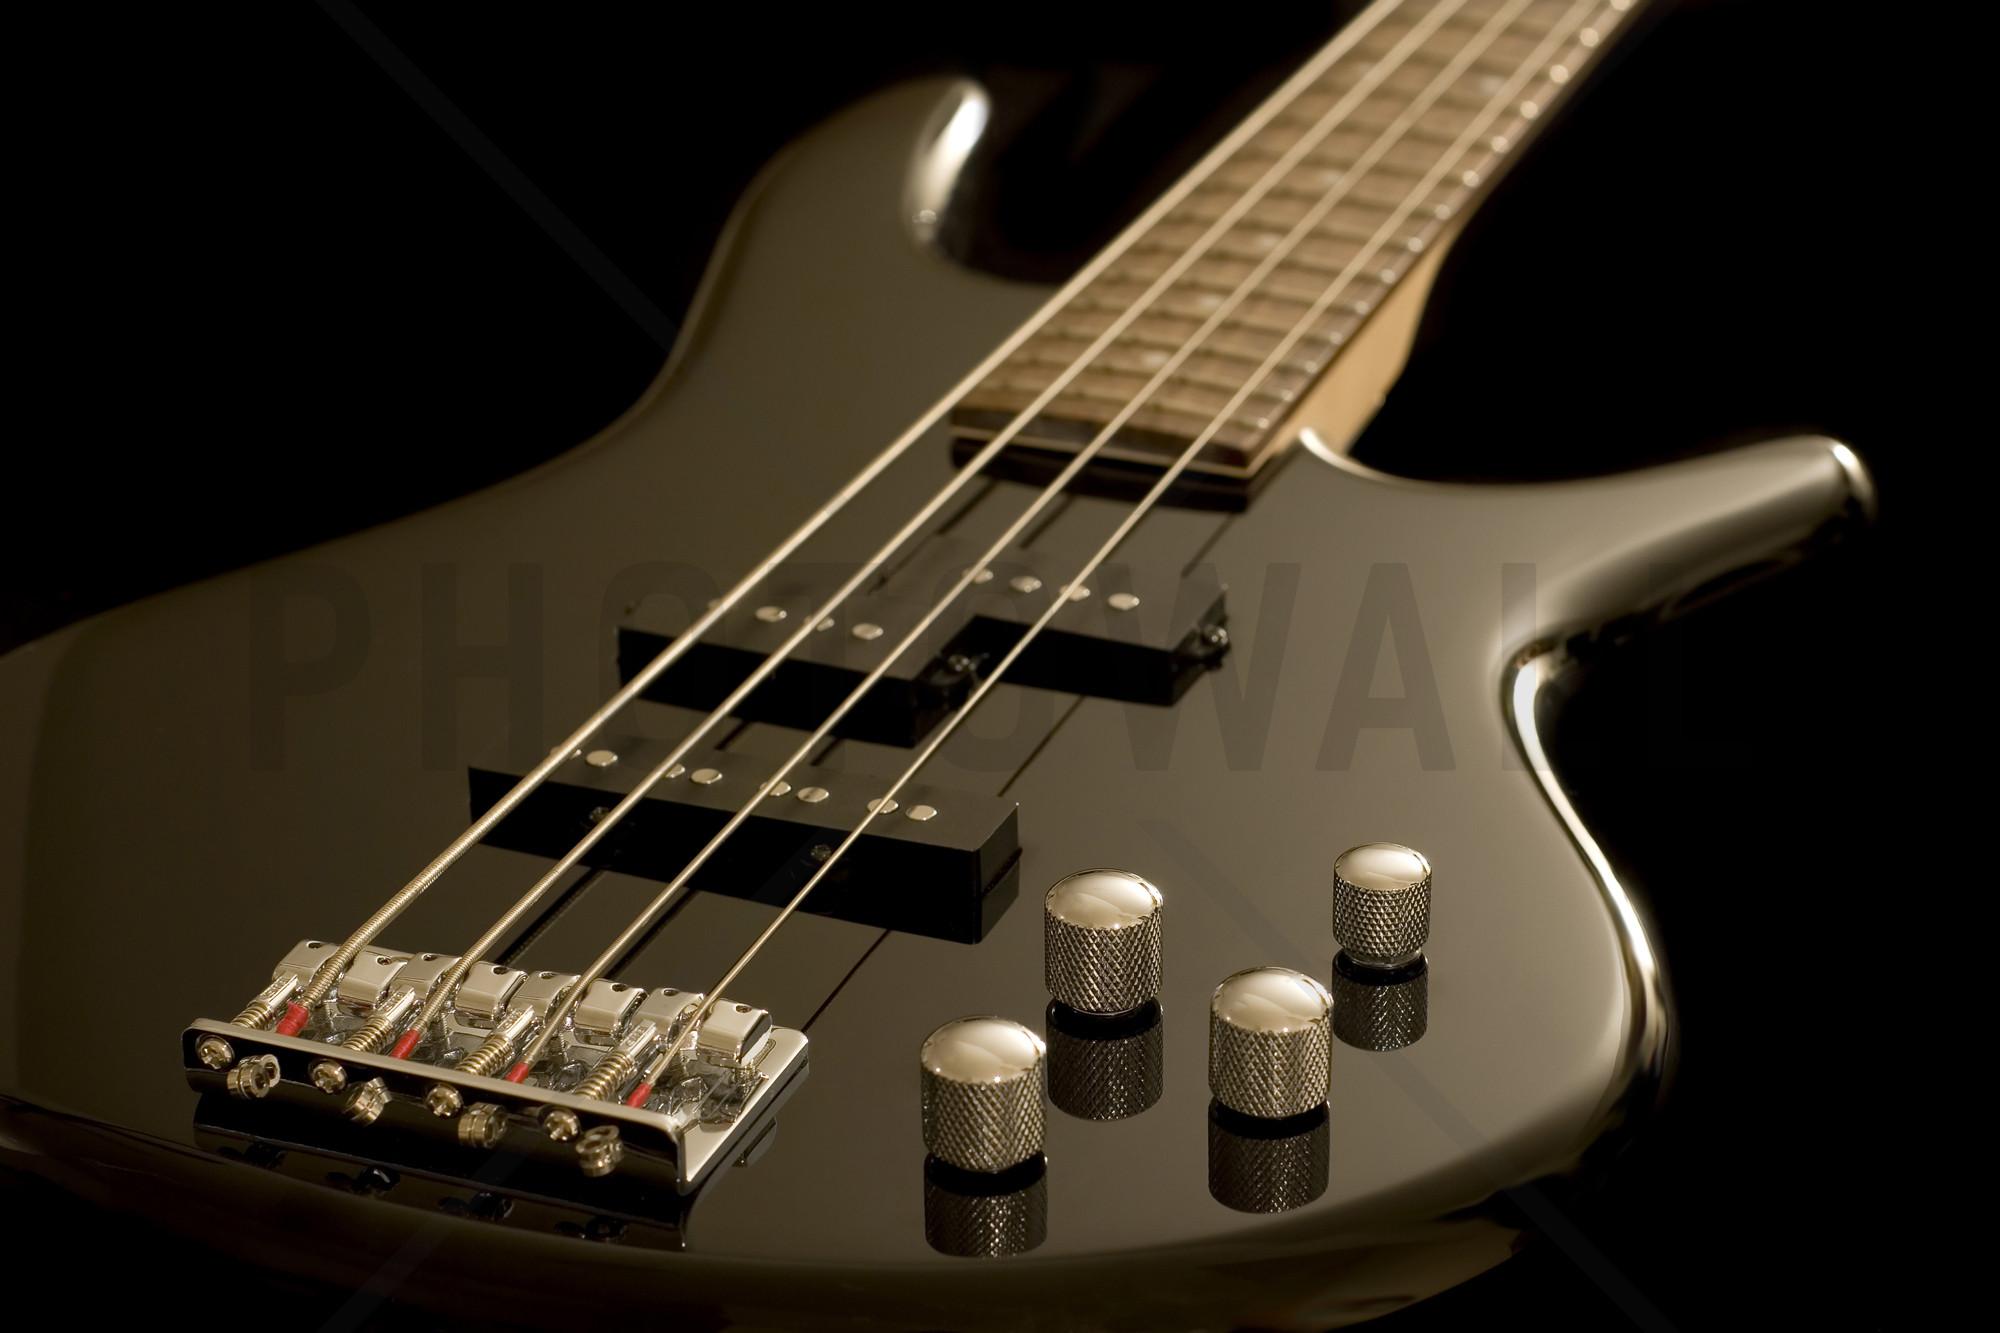 … Electric Bass Guitar | Wall Mural amp Photo Wallpaper | Photowall